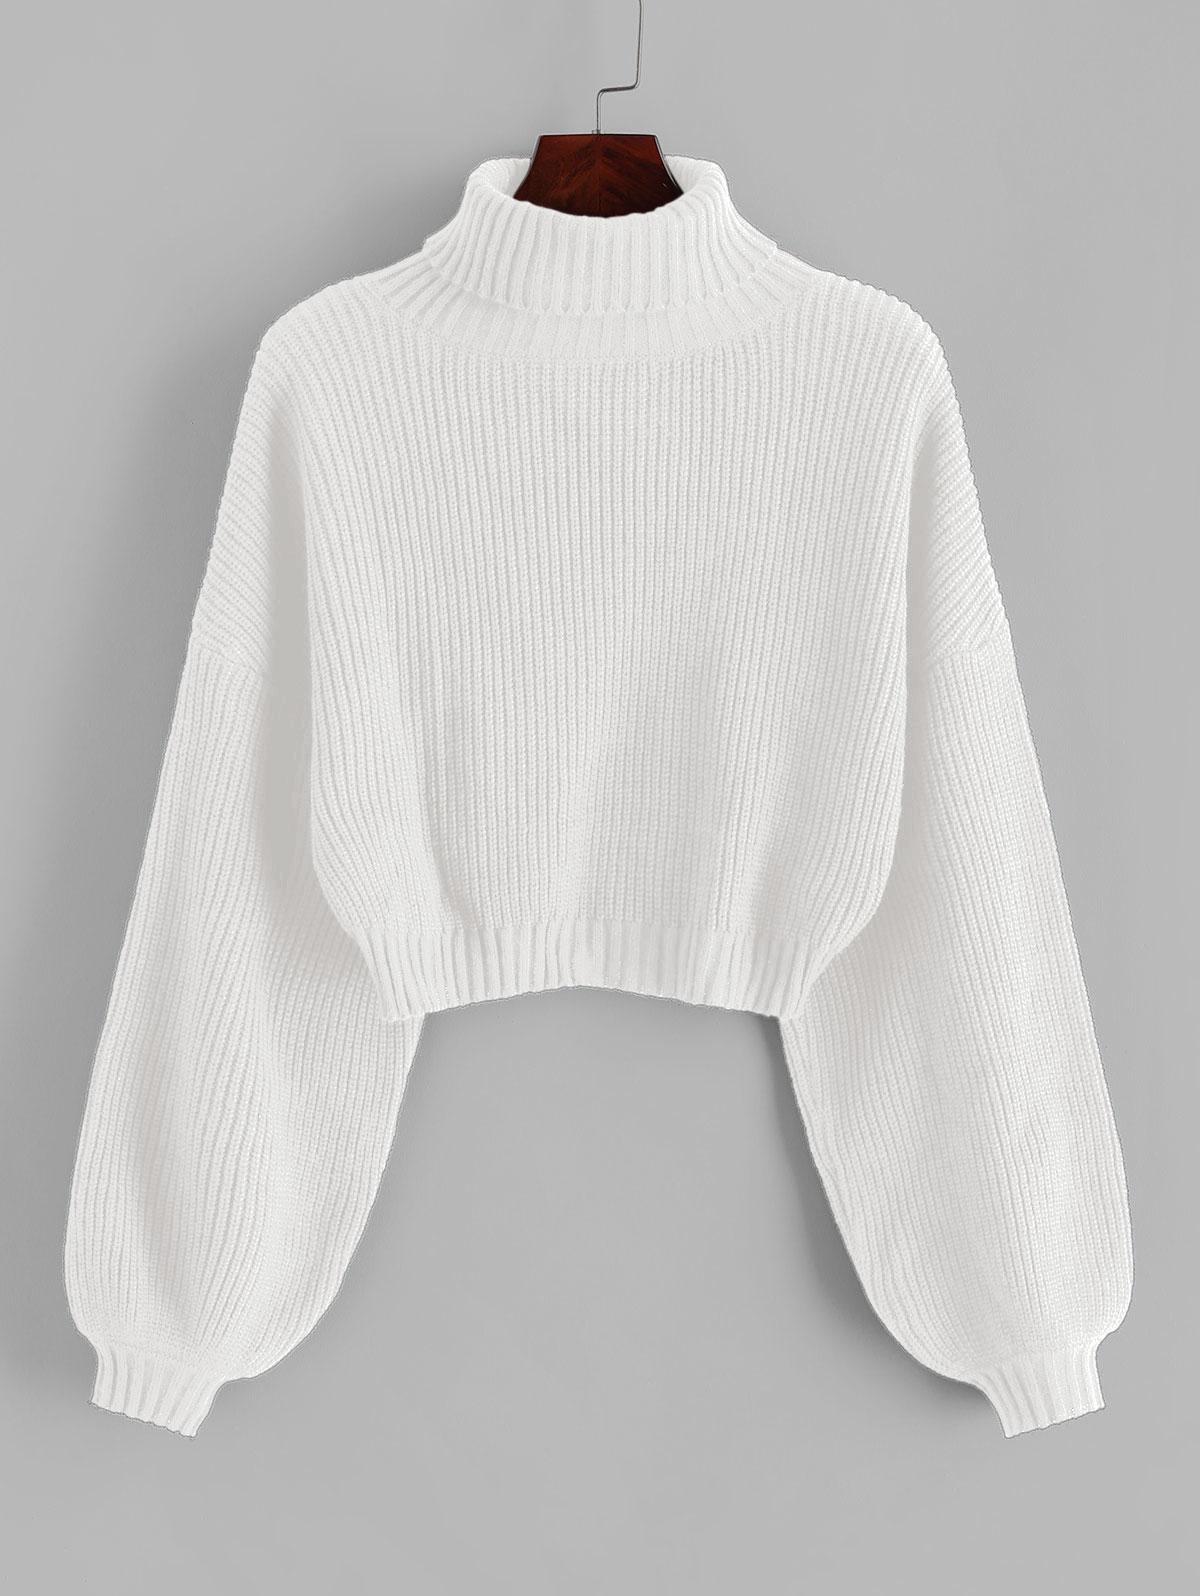 ZAFUL Turtleneck Lantern Sleeve Cropped Sweater